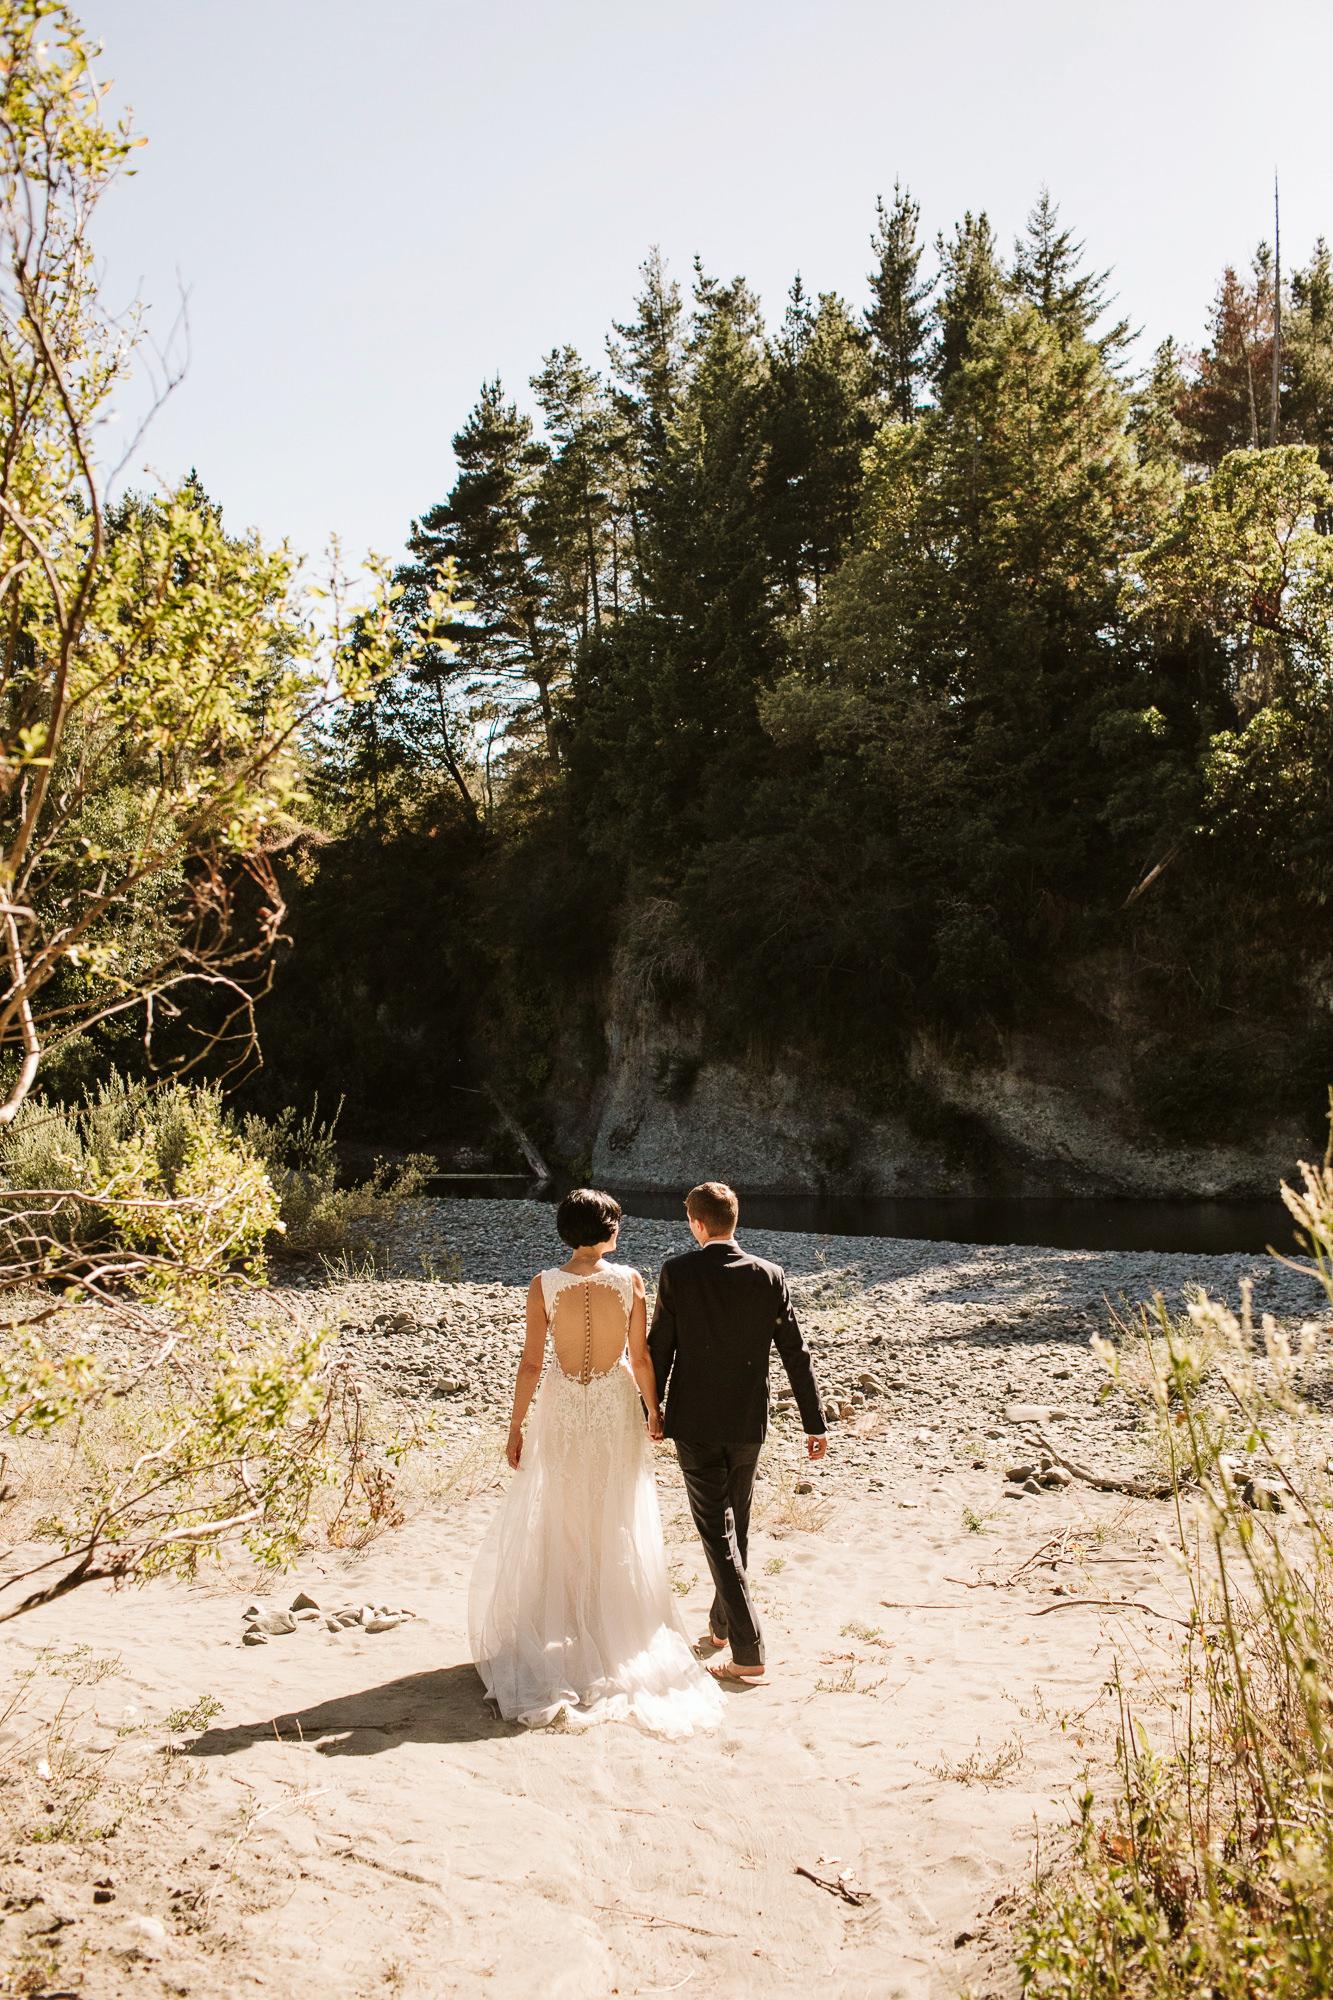 California-wedding-photographer-alfonso-flores-pamplin-groove-258.jpg